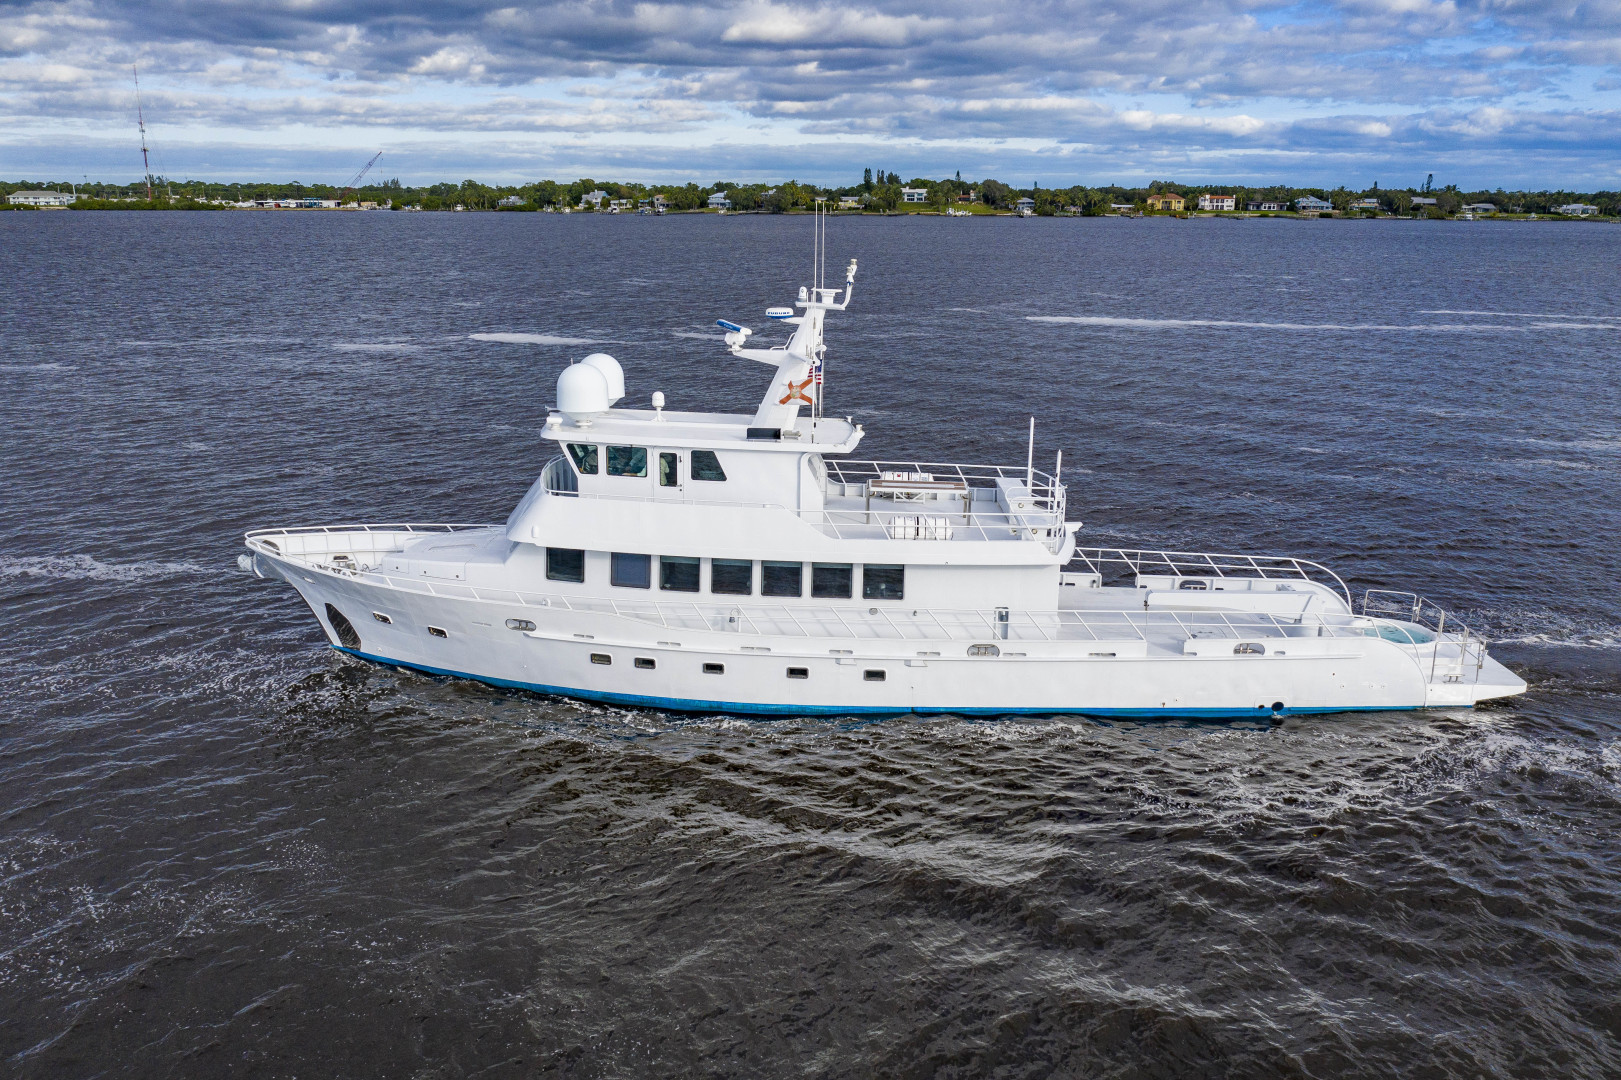 GlassTech-Expedition Yacht 2018-Reset Stuart-Florida-United States-Profile-1568523 | Thumbnail